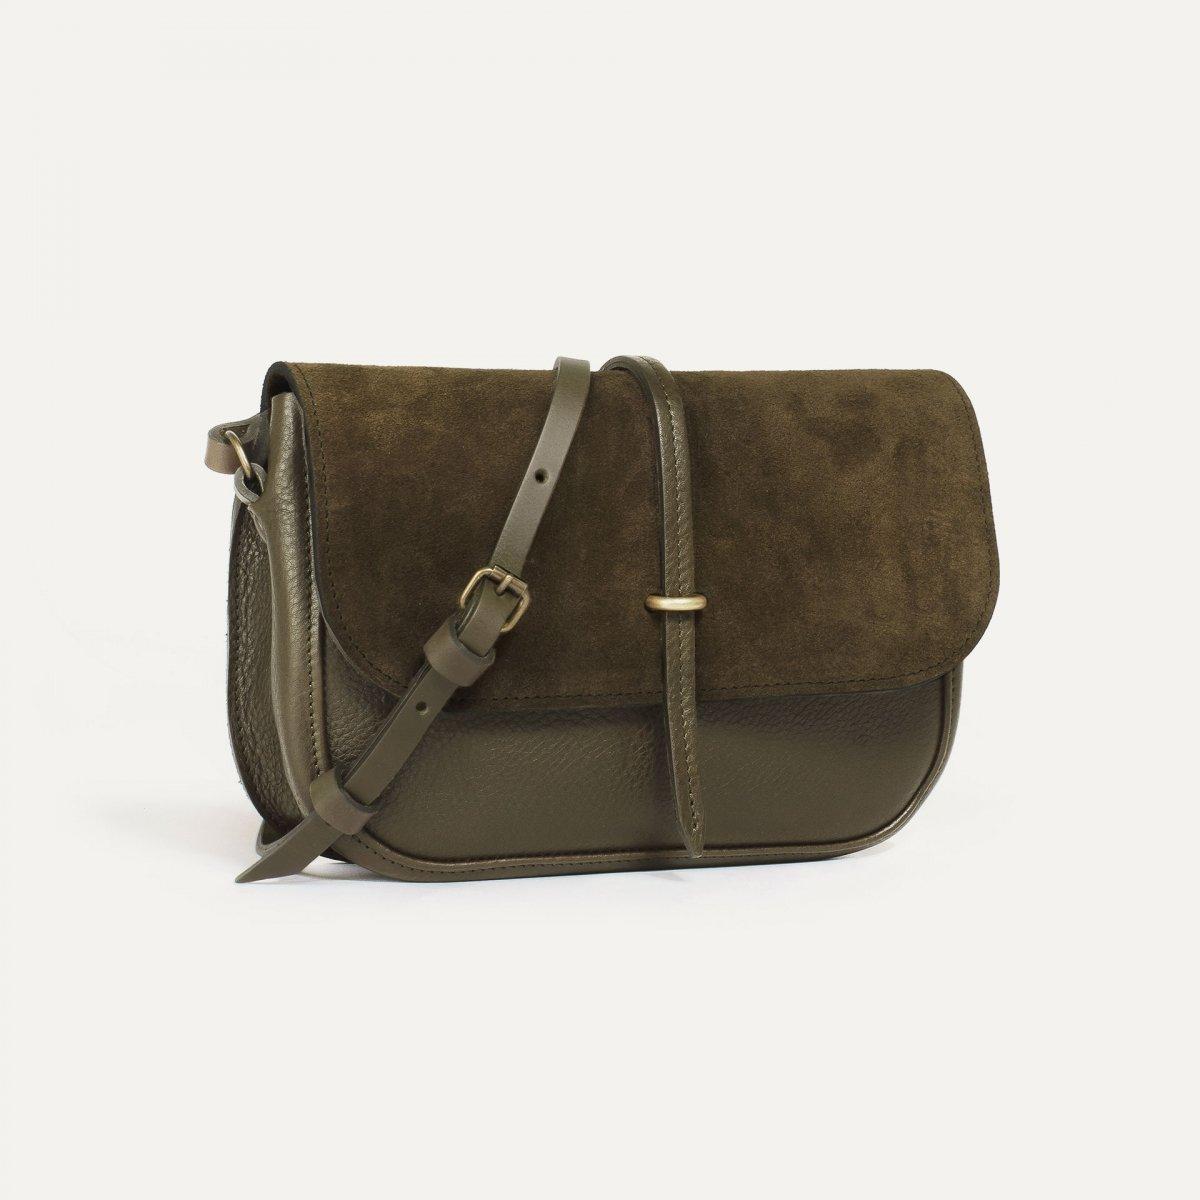 Pastis handbag - Khaki / Mix (image n°2)